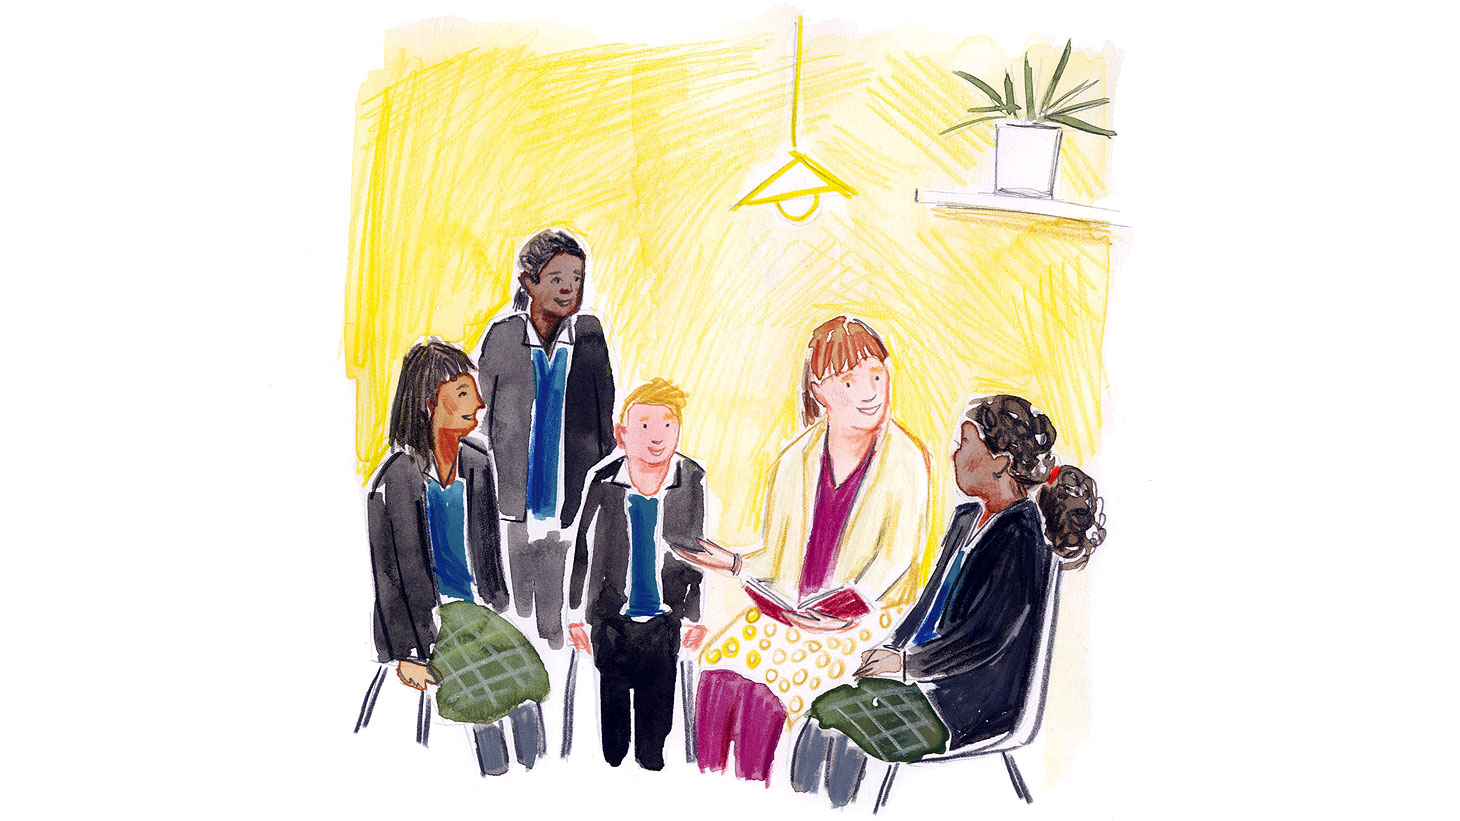 Illustration of schools worker by Elisa Cunningham